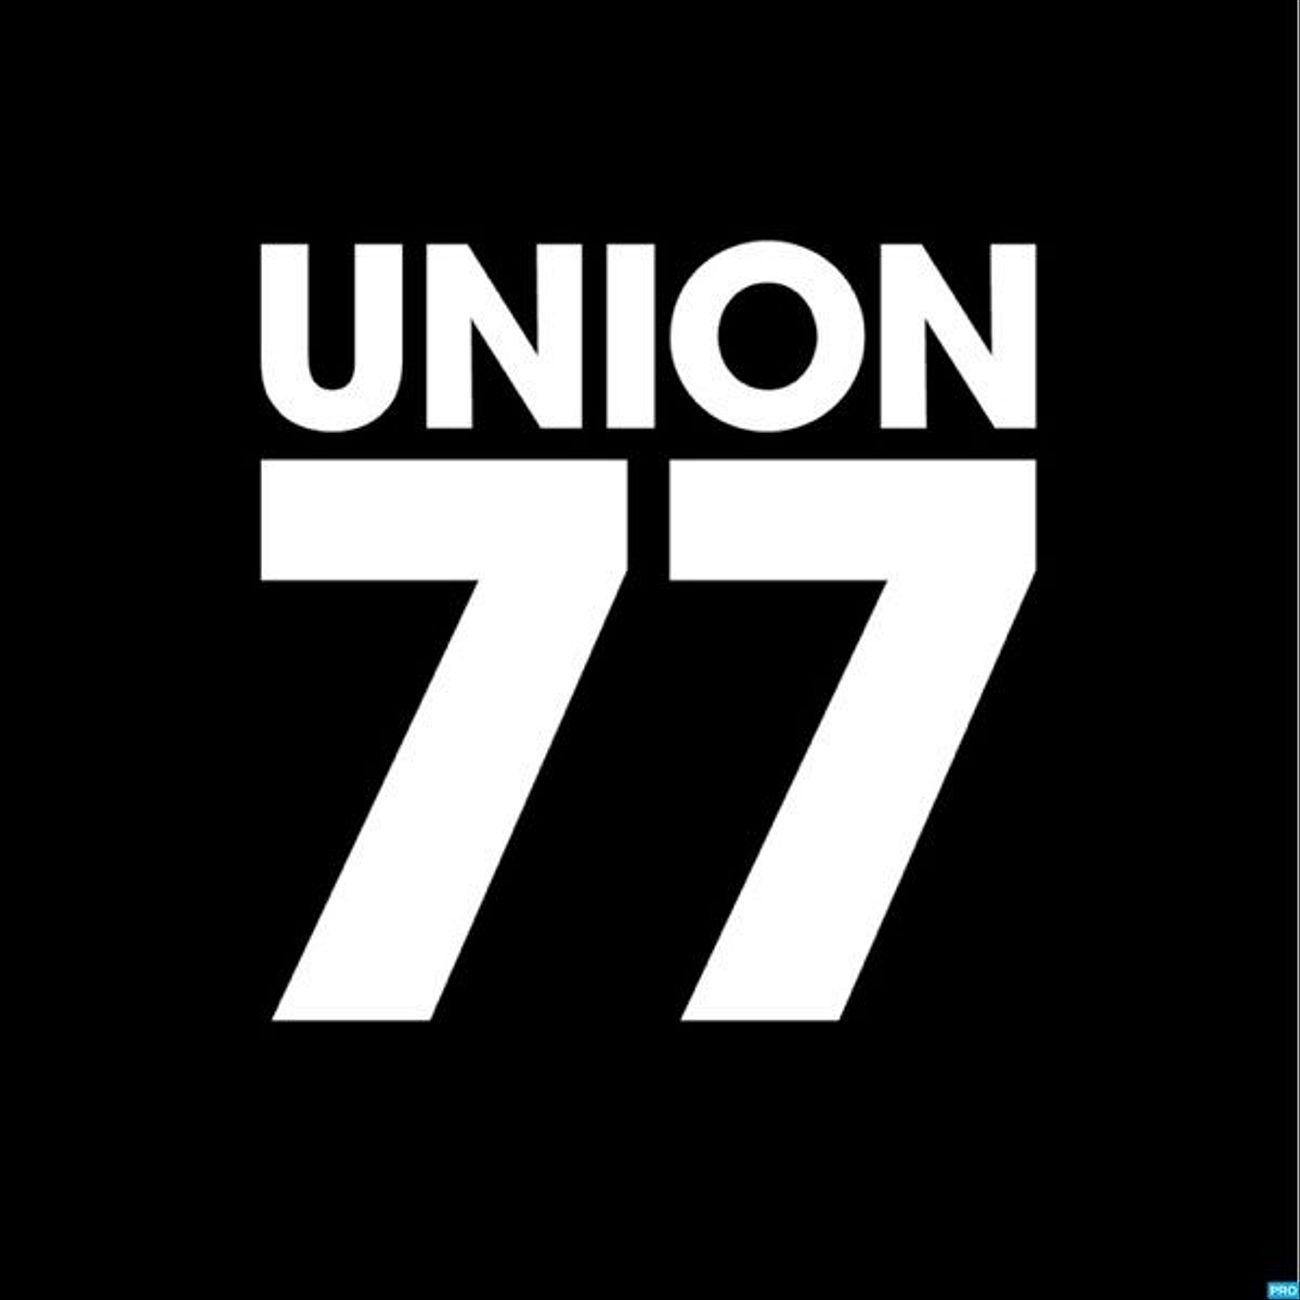 UNION 77